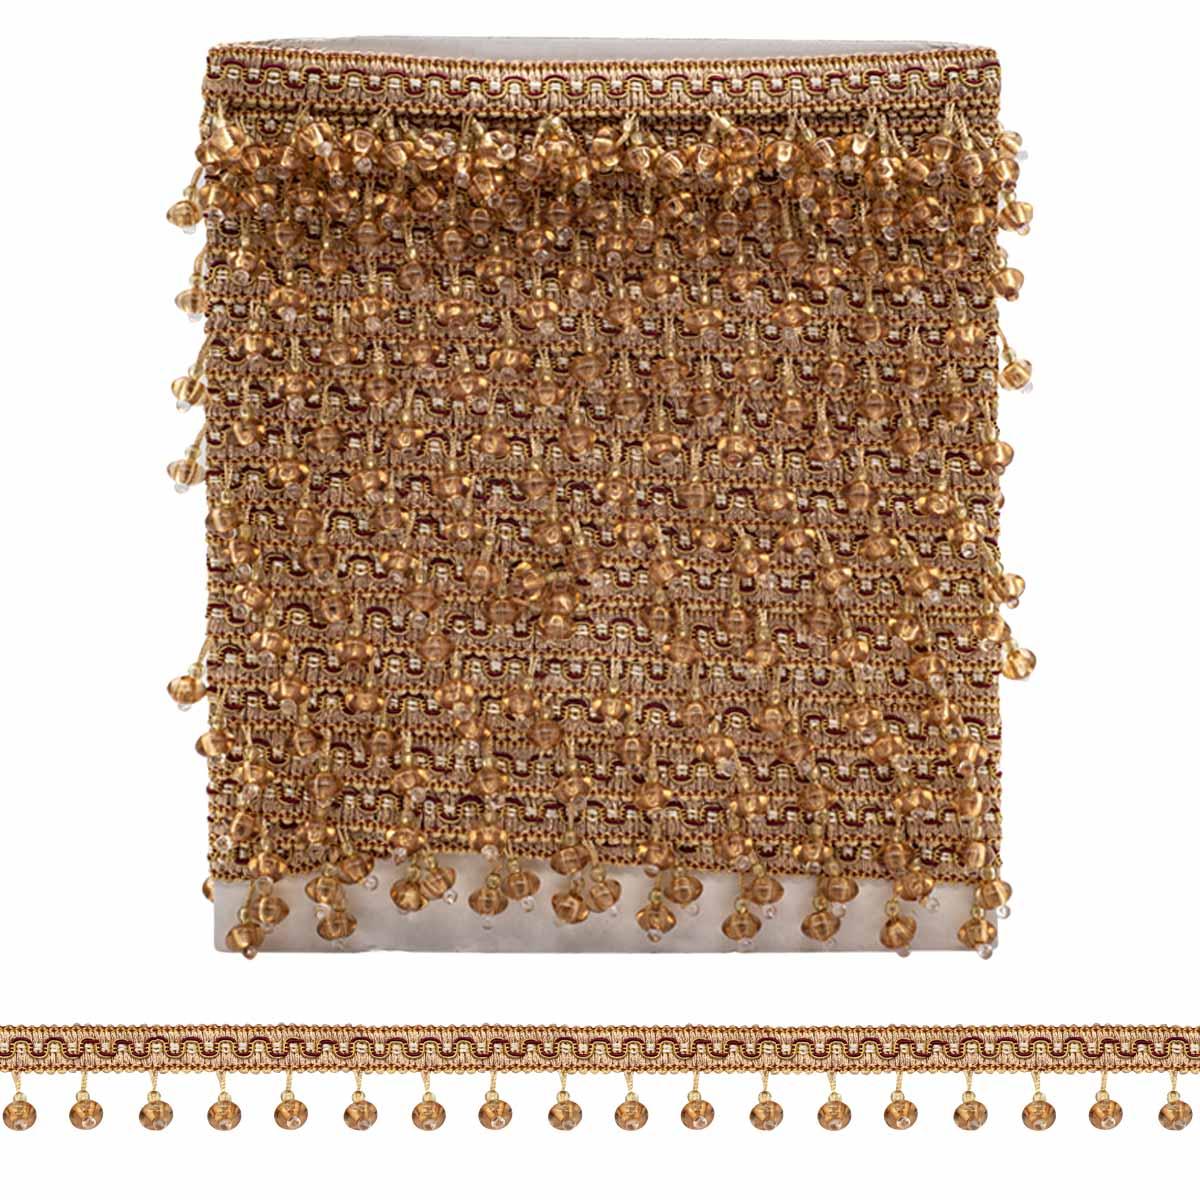 RY20-6 светло-коричнево/персиковый бахрома стеклярус (4 см/12 м)